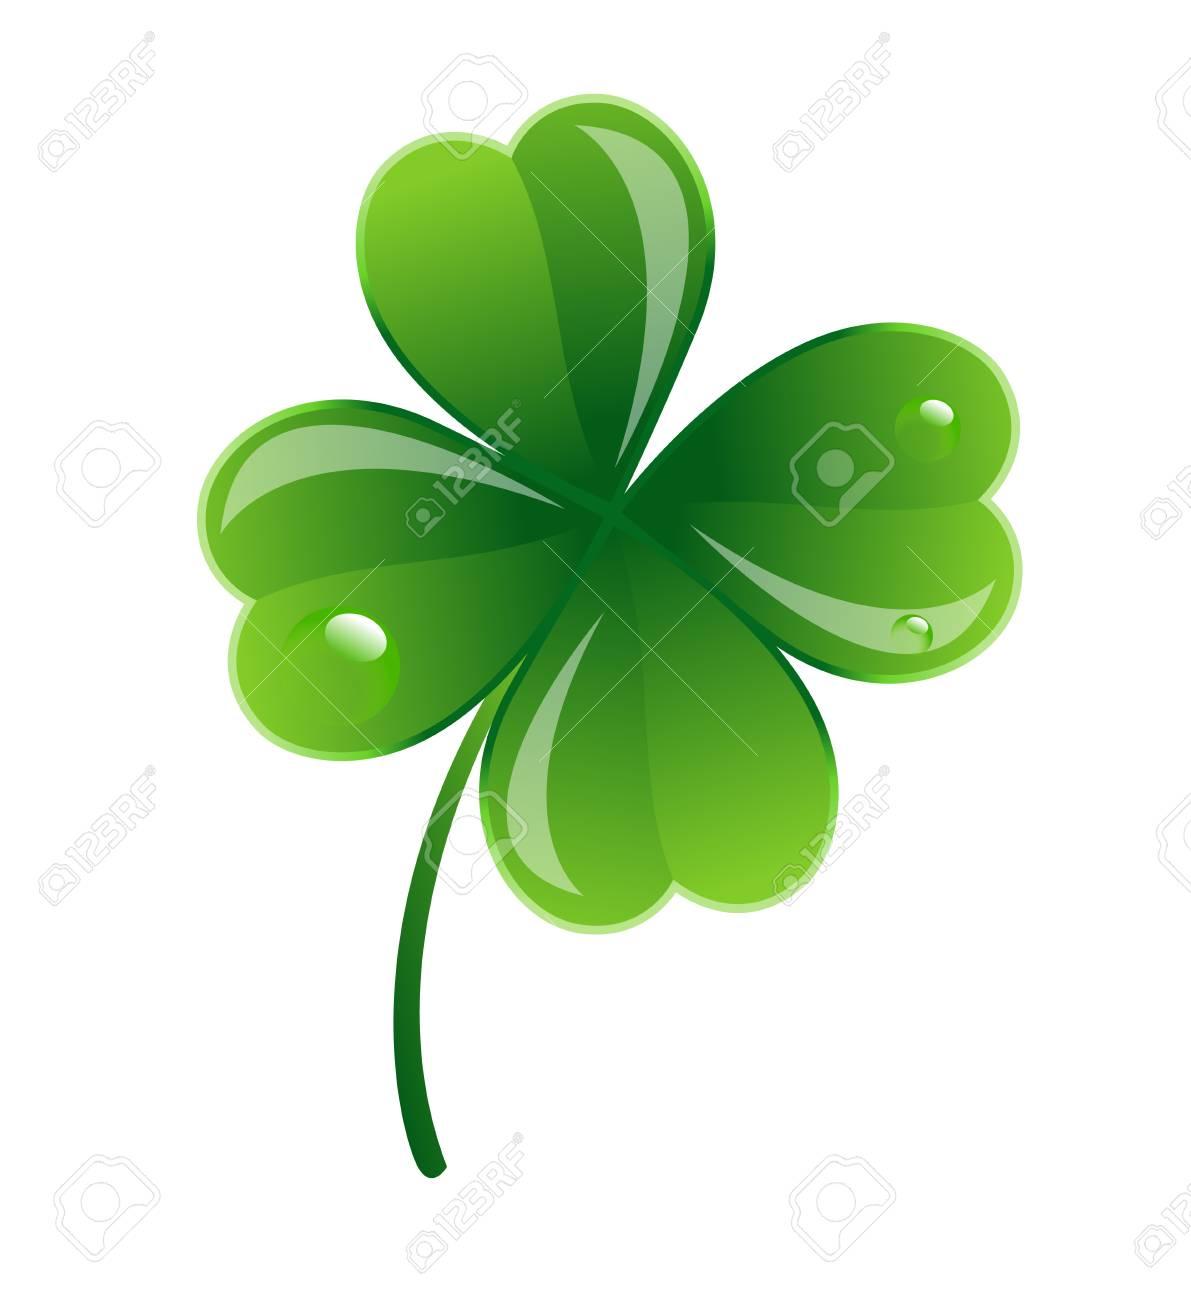 Glossy Clover Leaf Stock Vector - 12654994